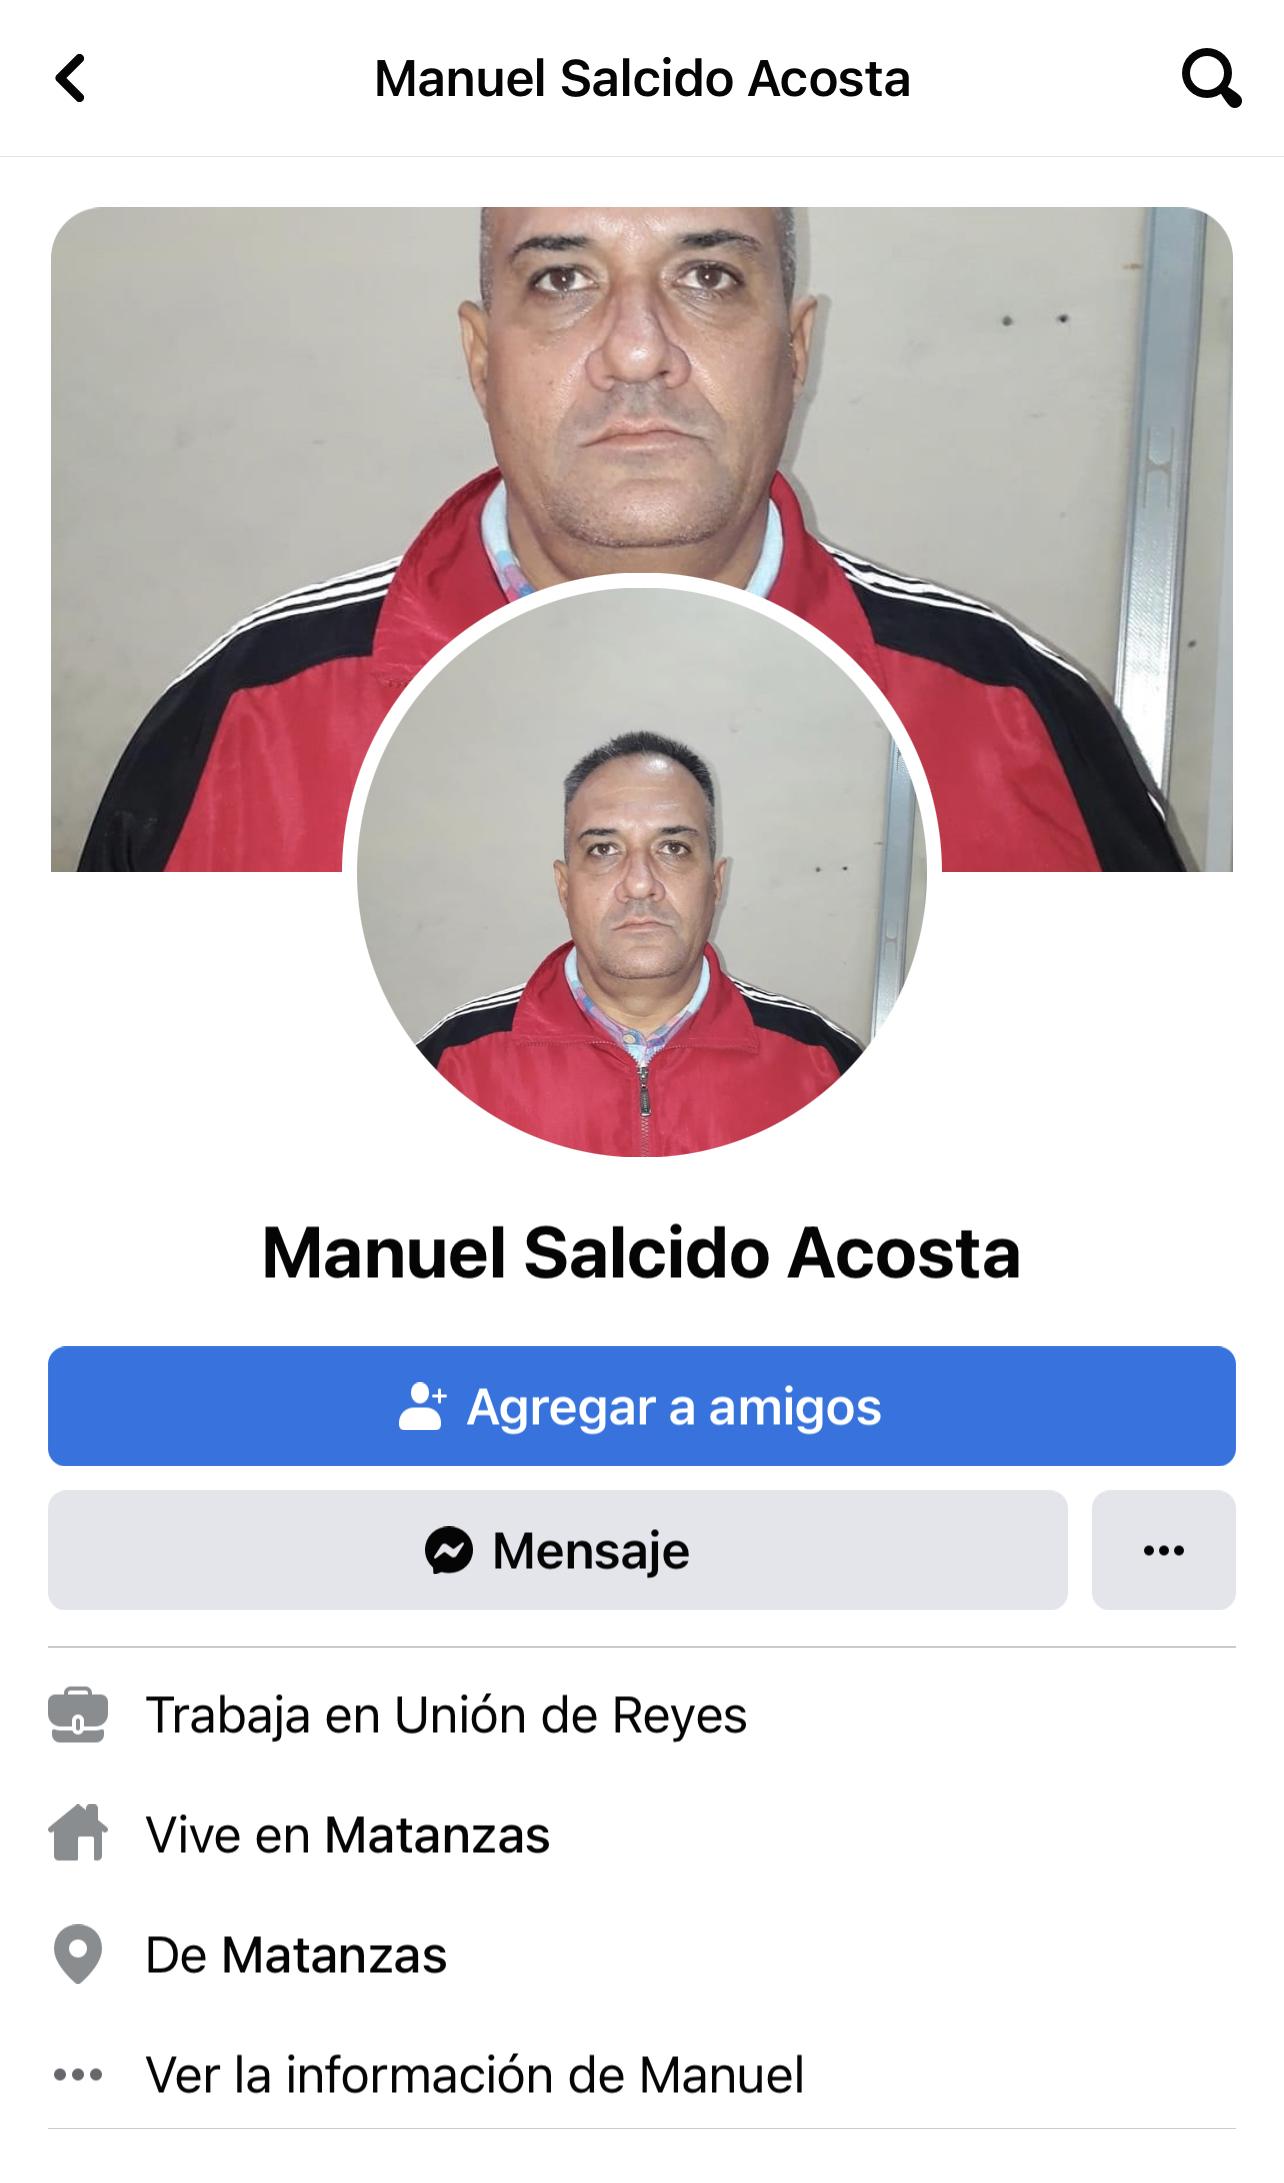 Manuel Salcido Acosta